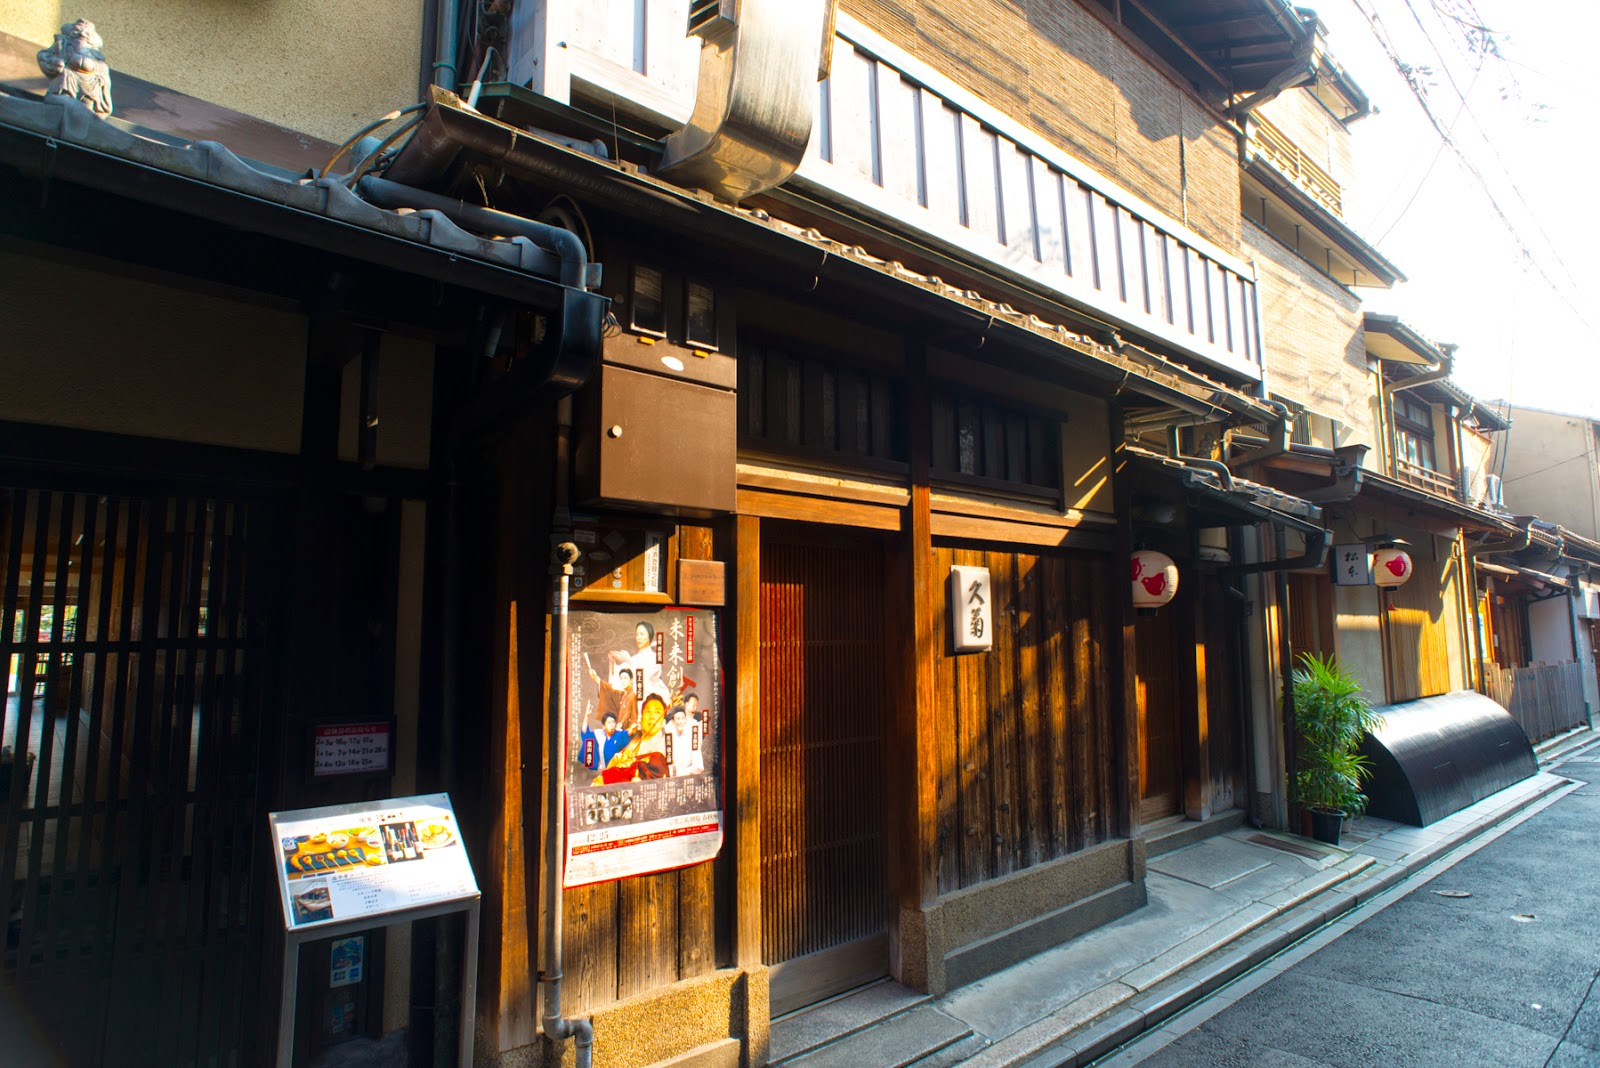 Tokiwai's Photo Blog: 京都先斗町